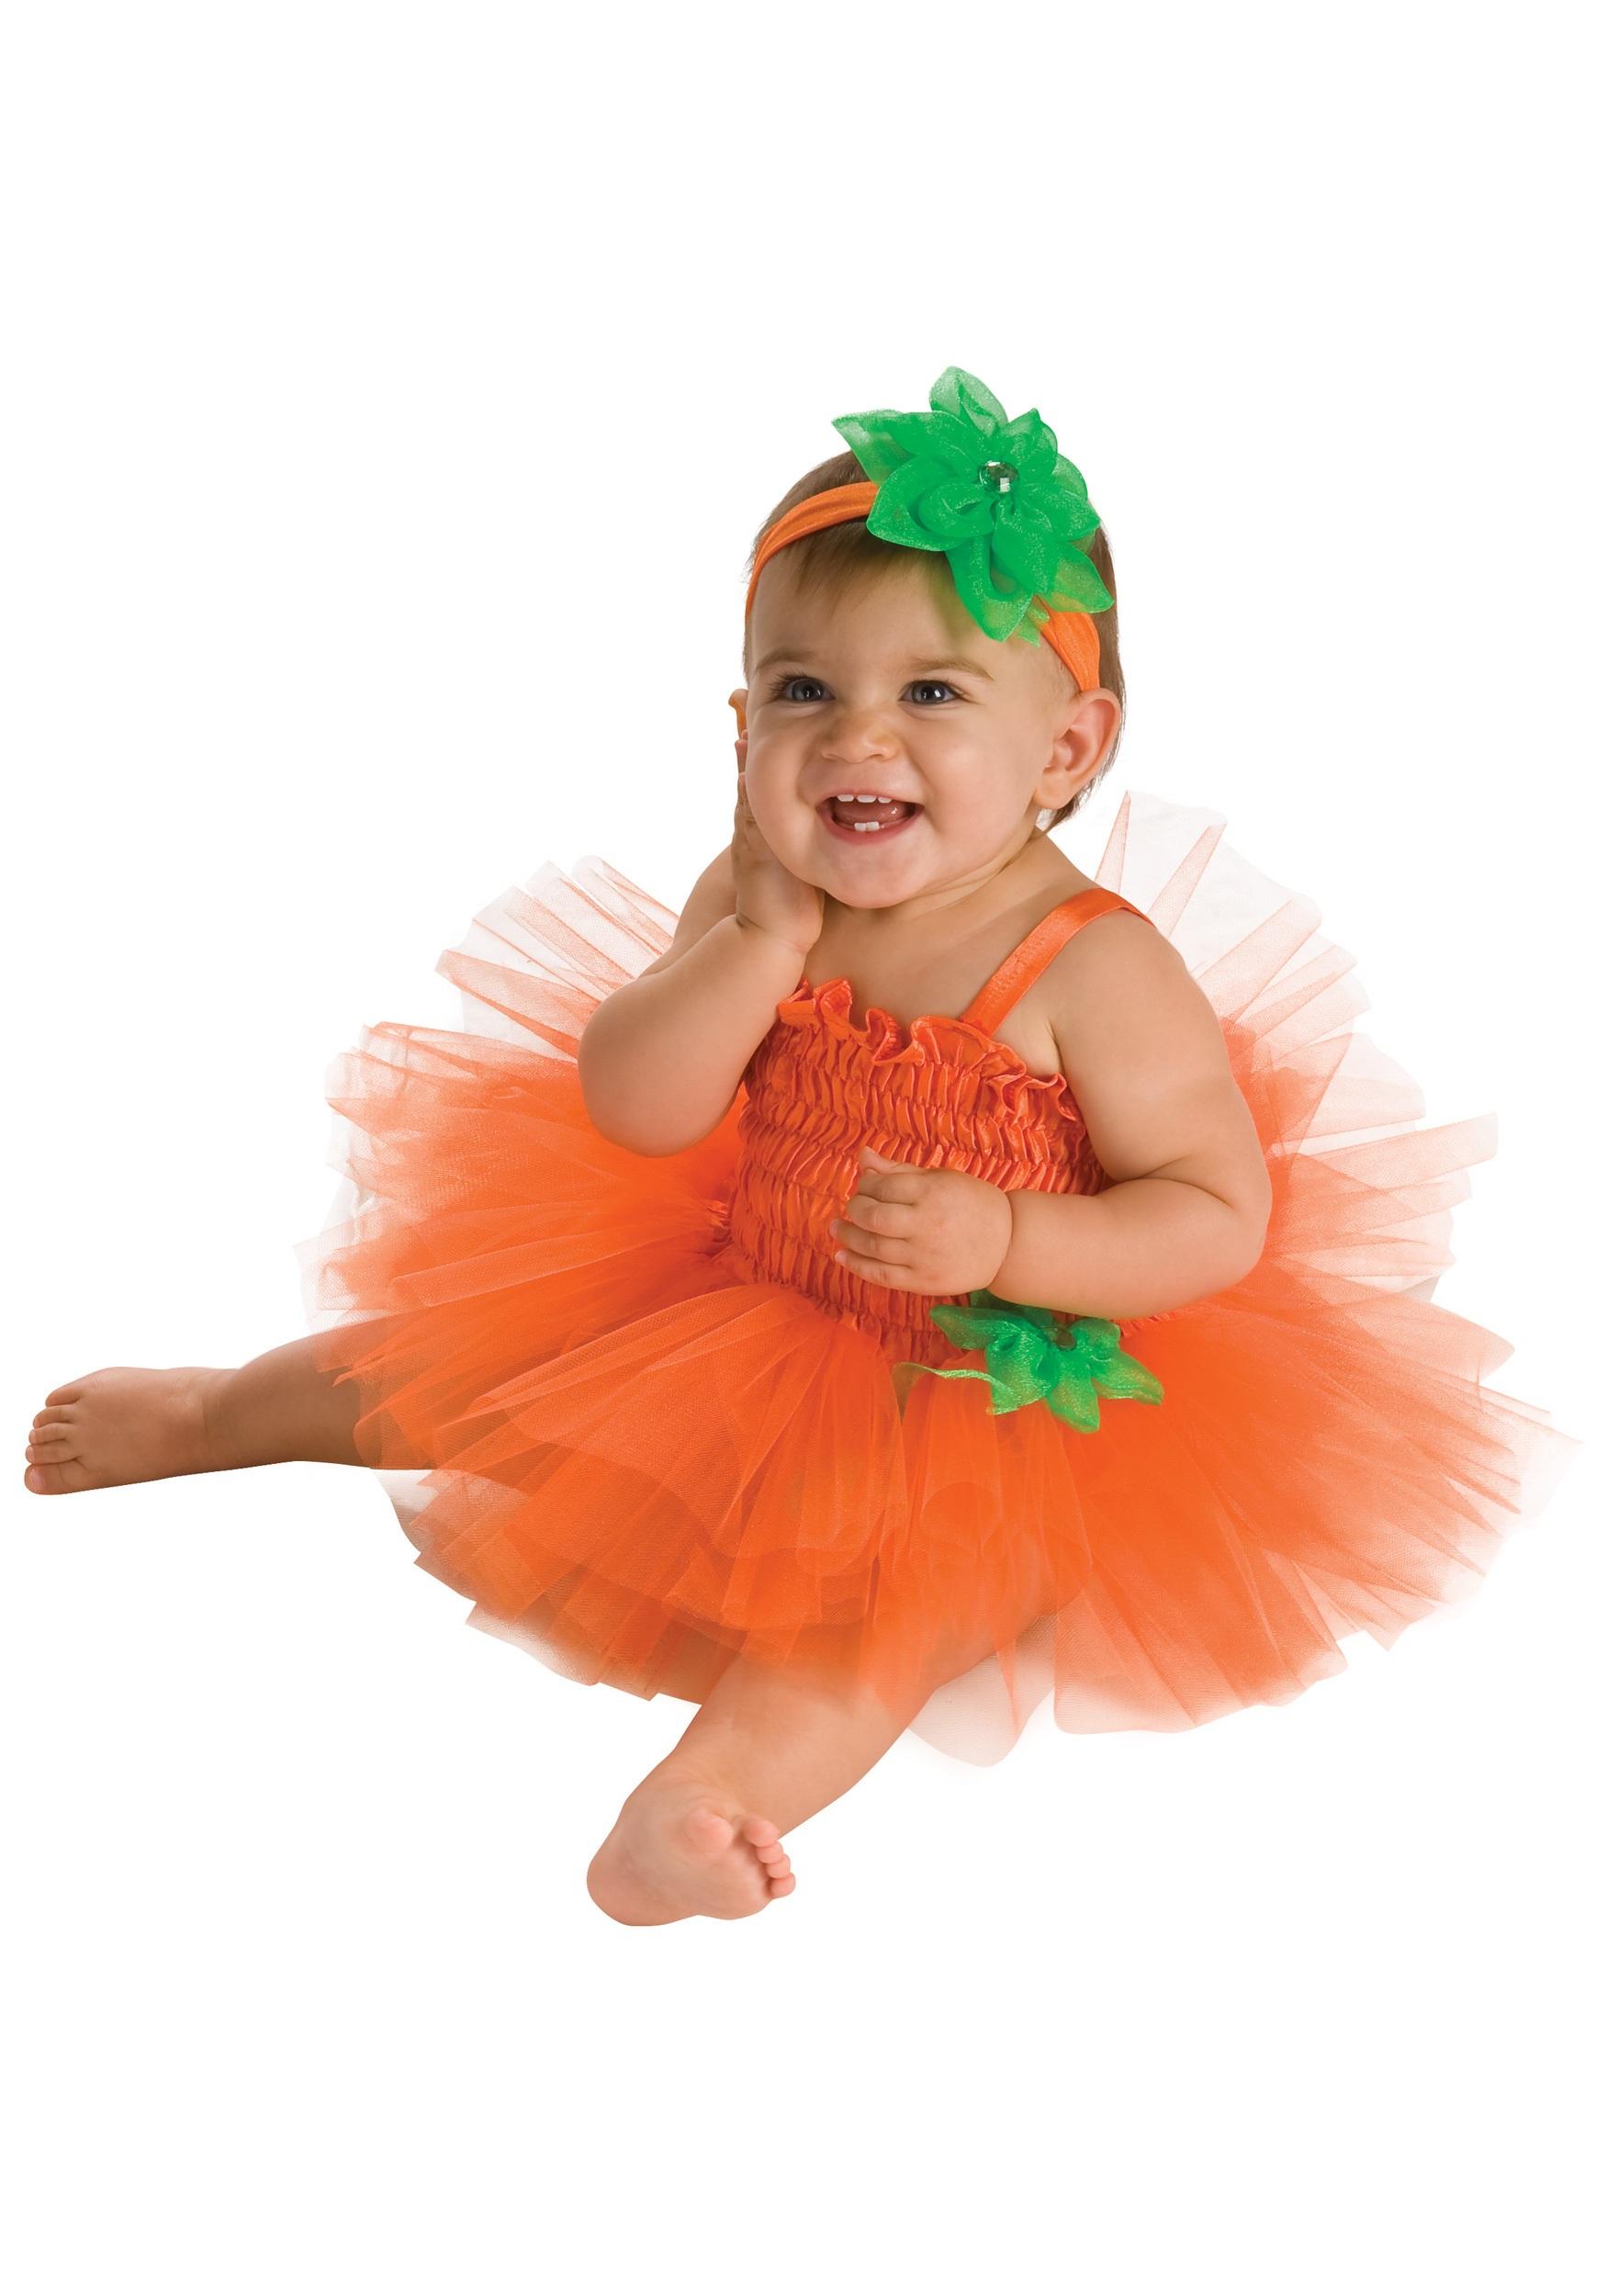 10 Wonderful Baby Costume Ideas For Girls infant pumpkin tutu dress costume 2021